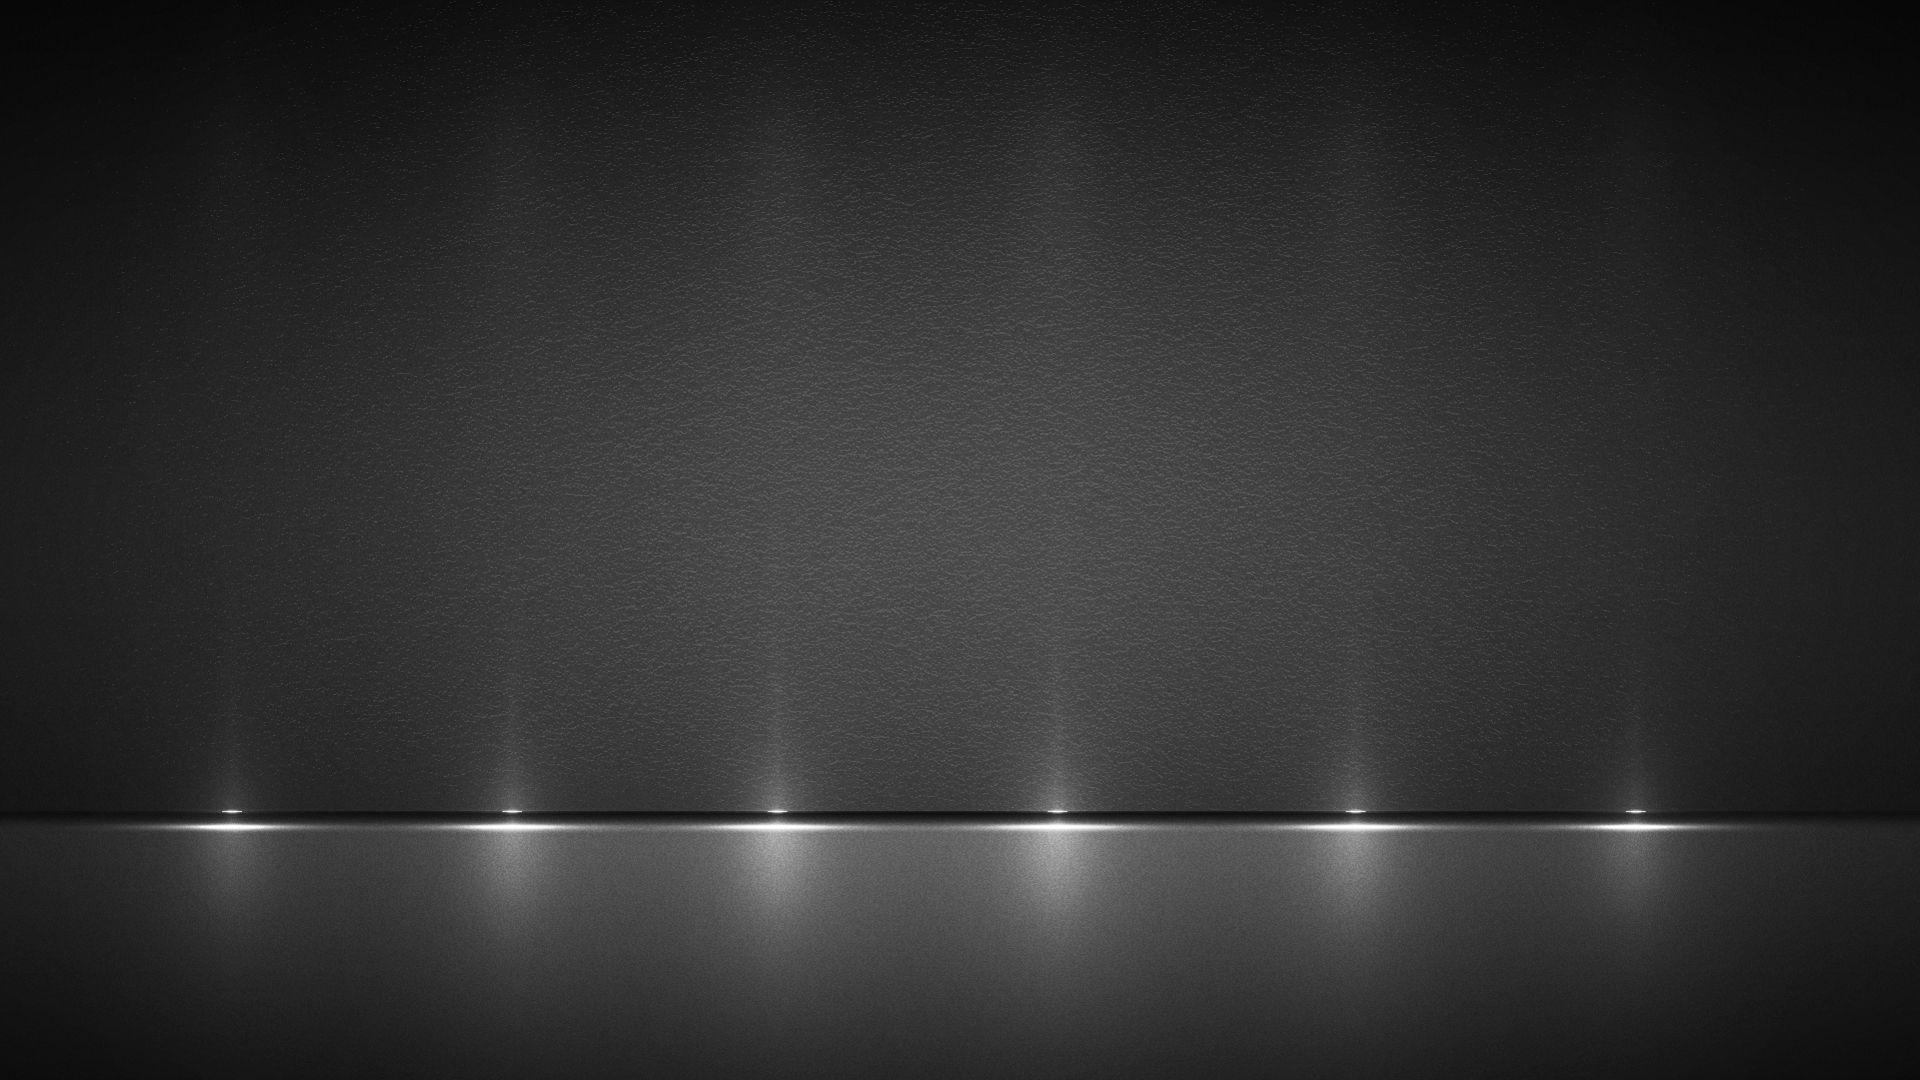 Light Grey pc wallpaper